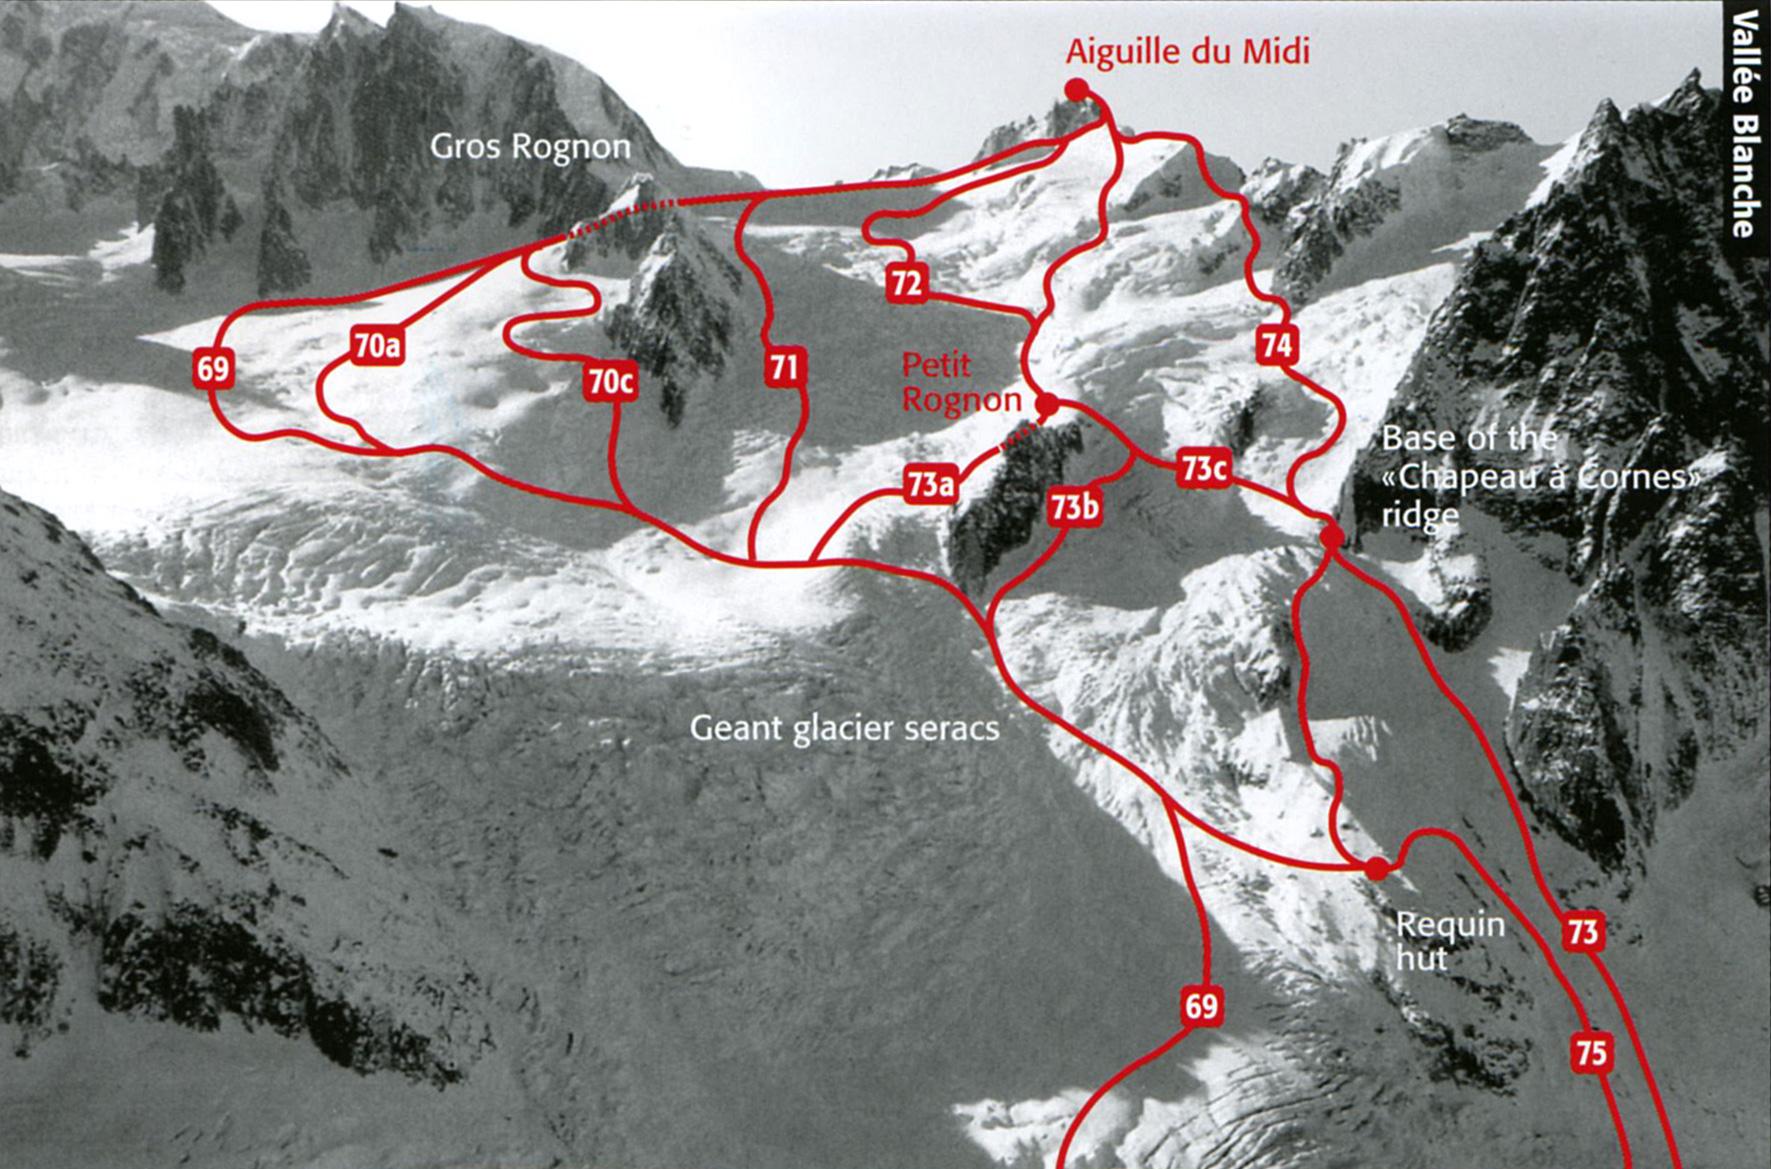 Схема фрирайд маршрутов с Aiguille du Midi (размер 1771 × 1169 по клику)